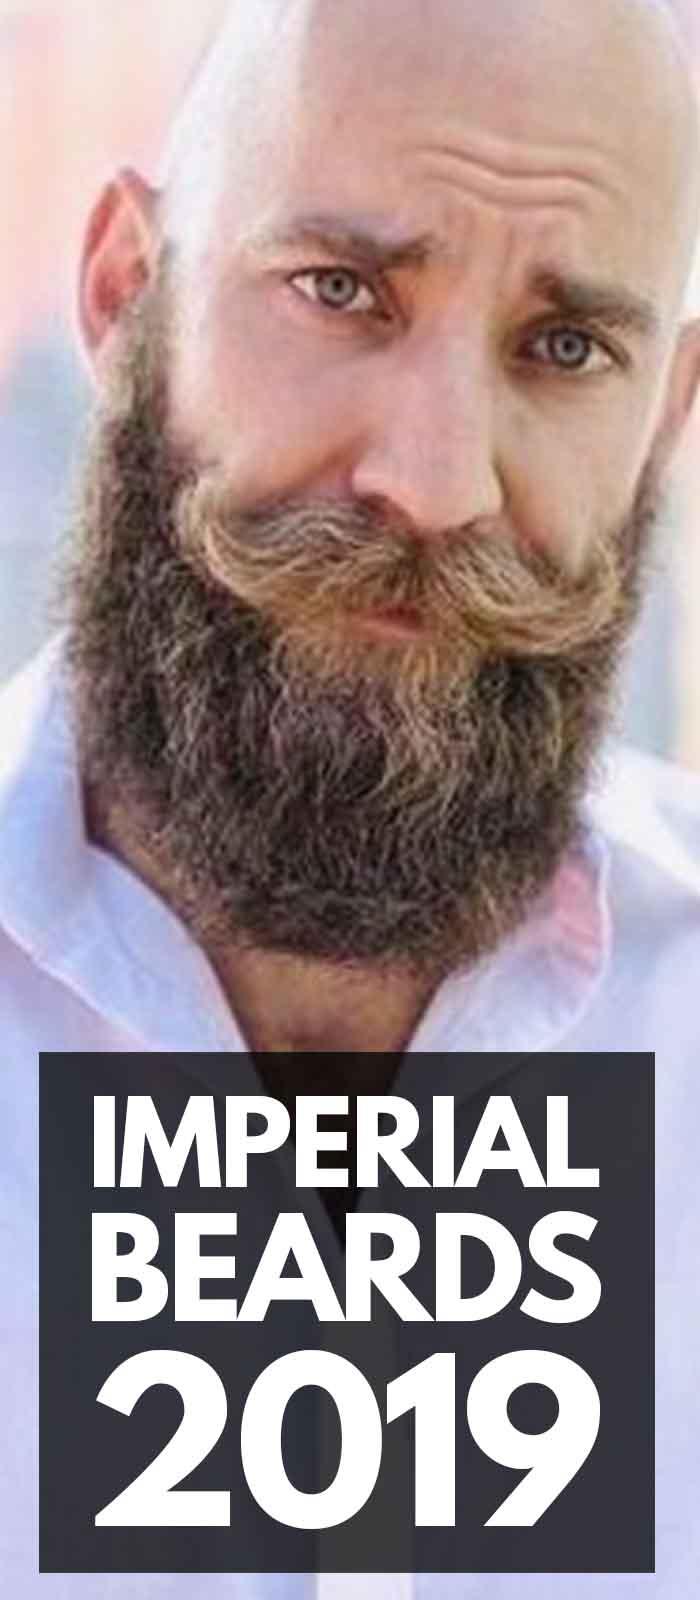 Imperial Beard look for stylish men!